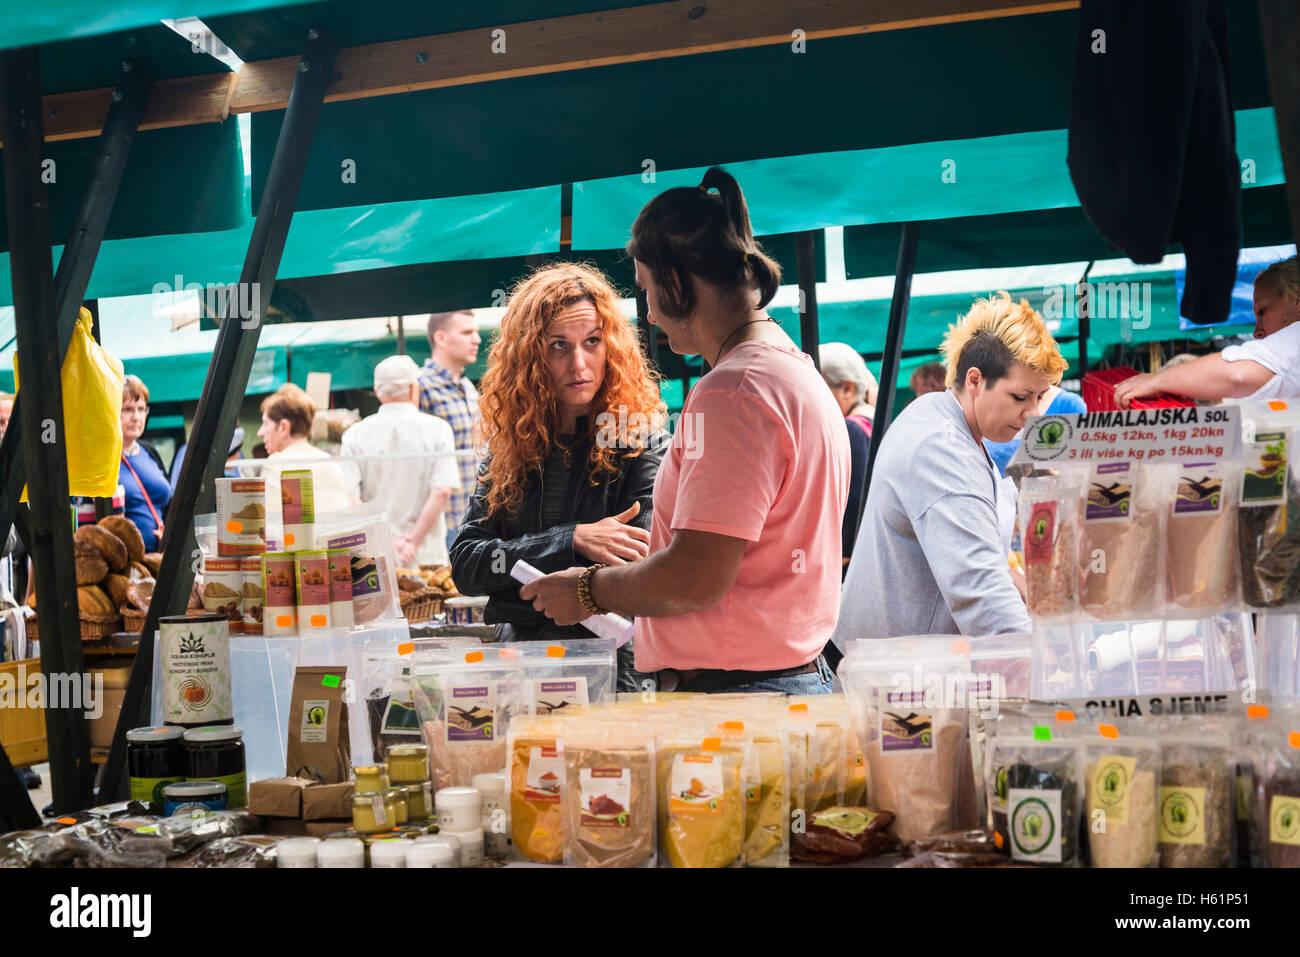 Producers' artisan market, Ban Jelacic Square, Zagreb, Croatia - Stock Image